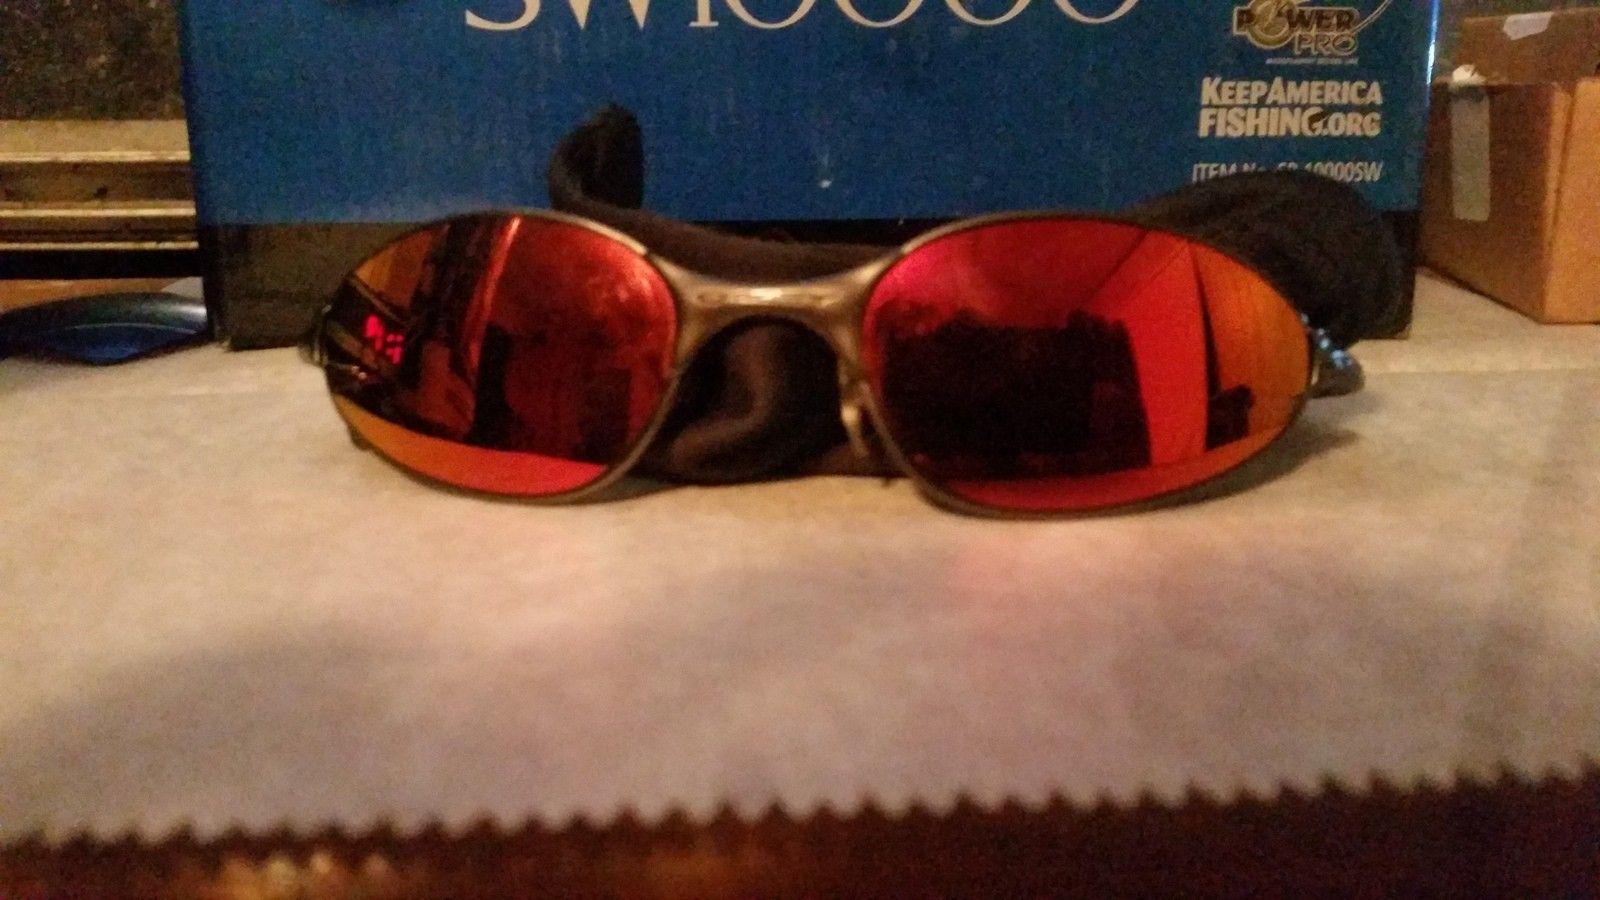 80638d09a6e Aftermarket Lenses - Revant Walleva Fuse Ikon Linegear...etc ...